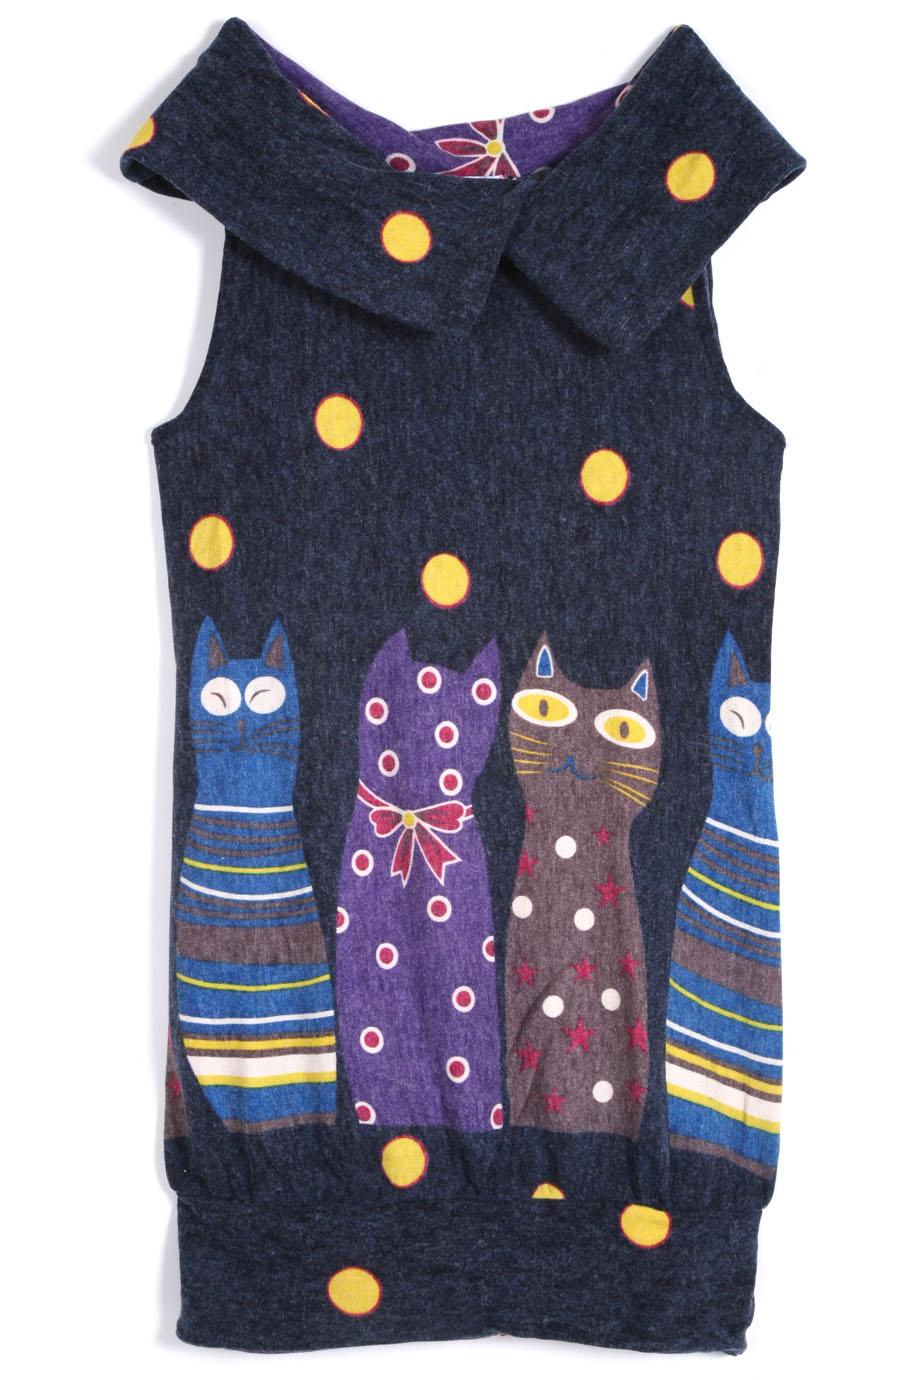 7ce8d59970df Γυναικεία ρούχα Kuch σε προσφορά | nethall.gr - Διαγωνισμοί με δώρα